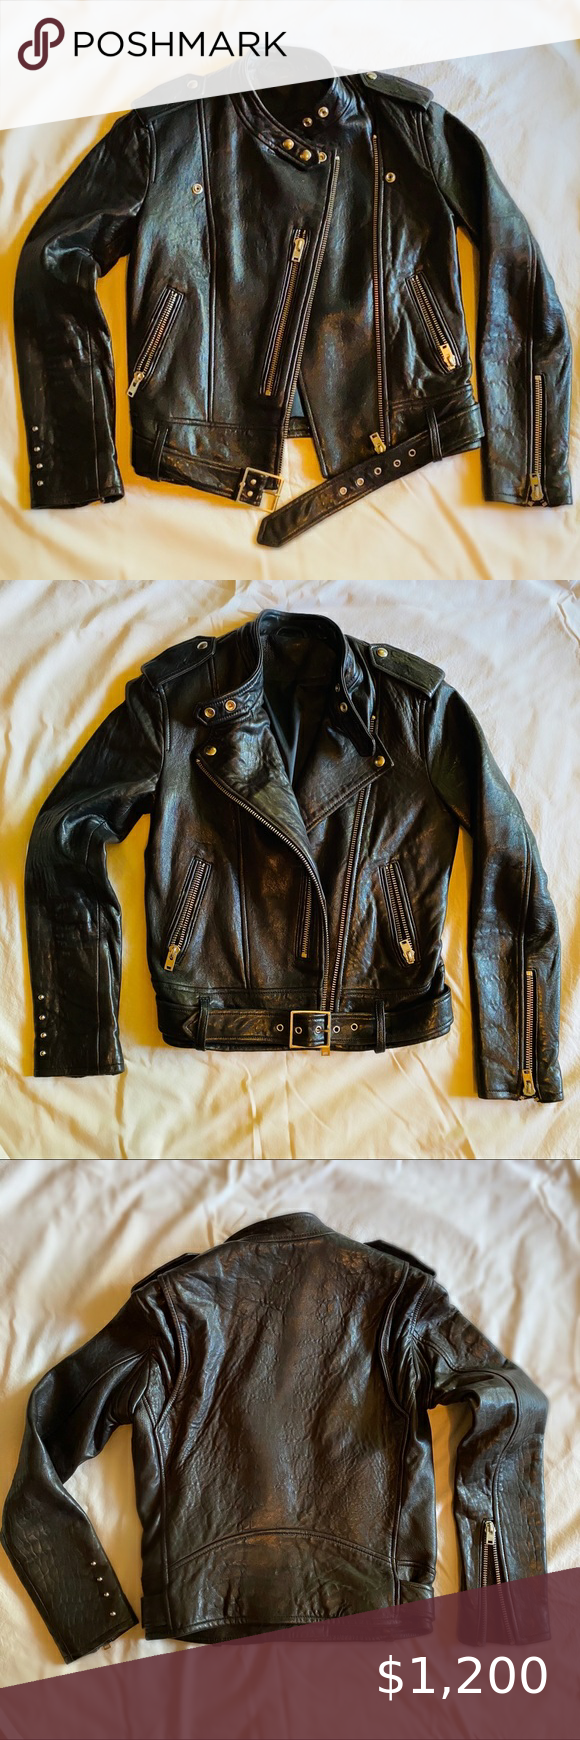 Iro Zaki Black Leather Biker Jacket Size 2 Black Leather Biker Jacket Leather Biker Jacket Biker Jacket [ 1740 x 580 Pixel ]